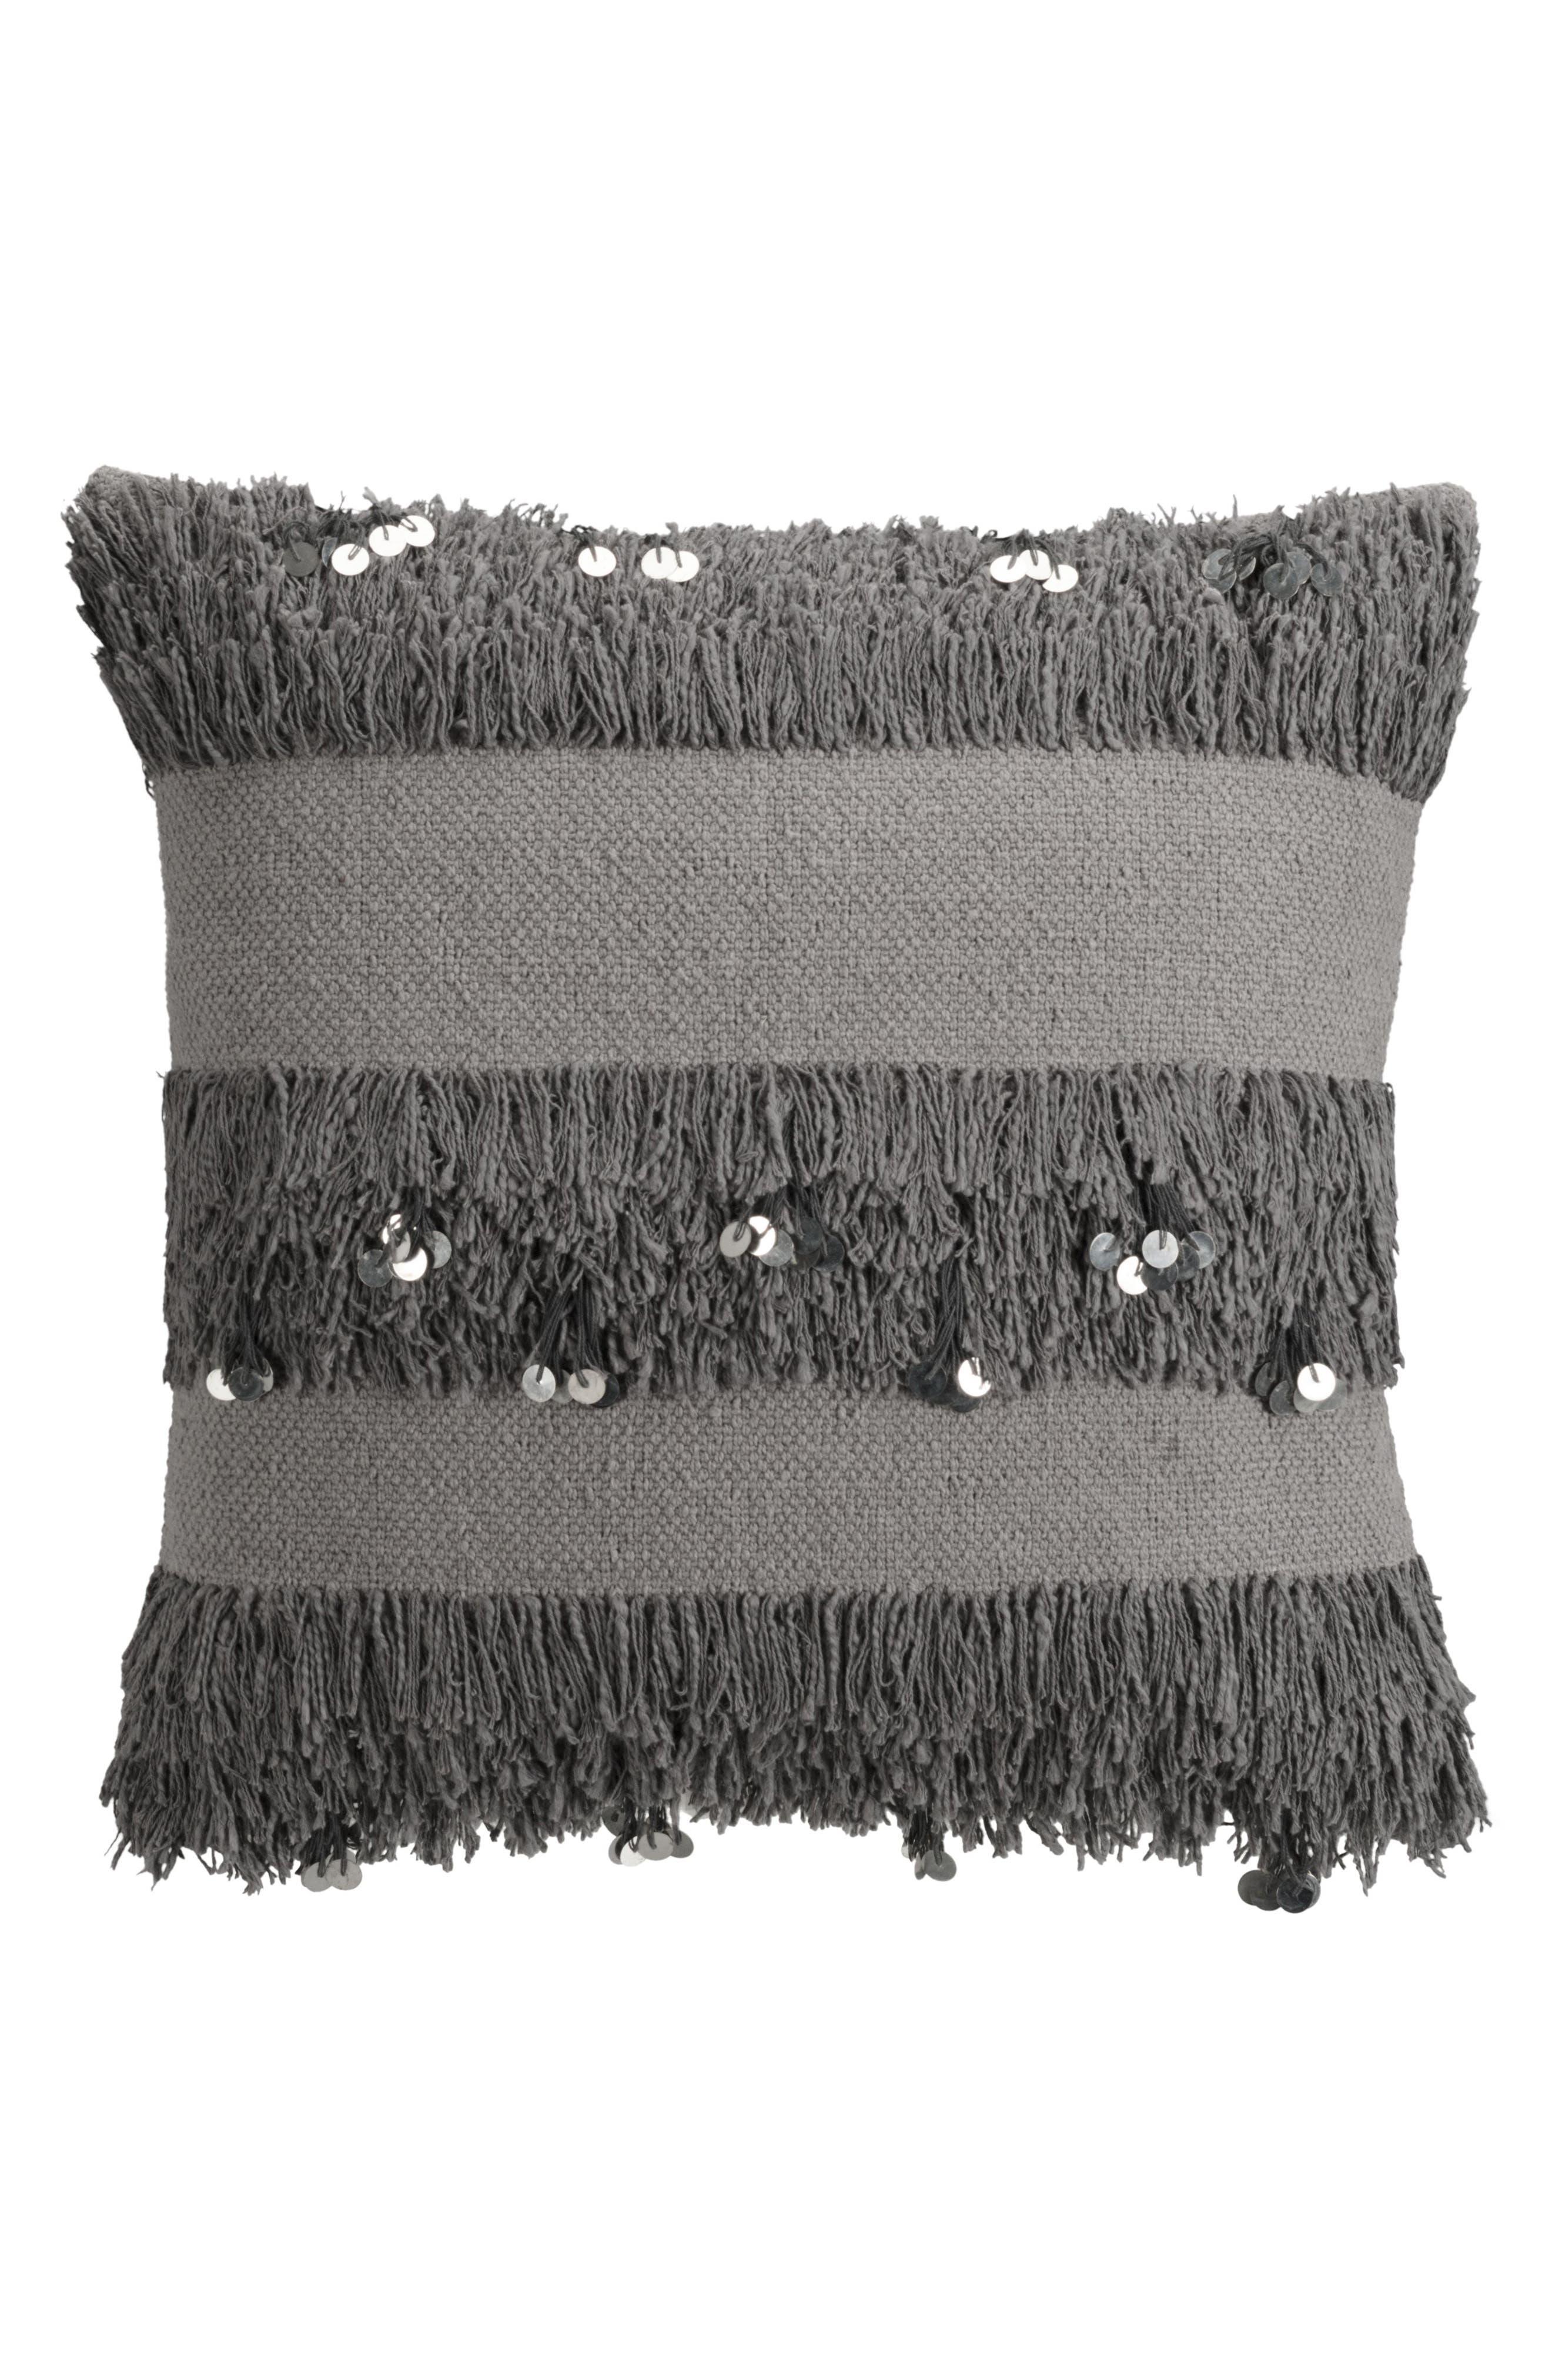 cupcakes & cashmere Sequin Fringe Pillow,                         Main,                         color, Grey